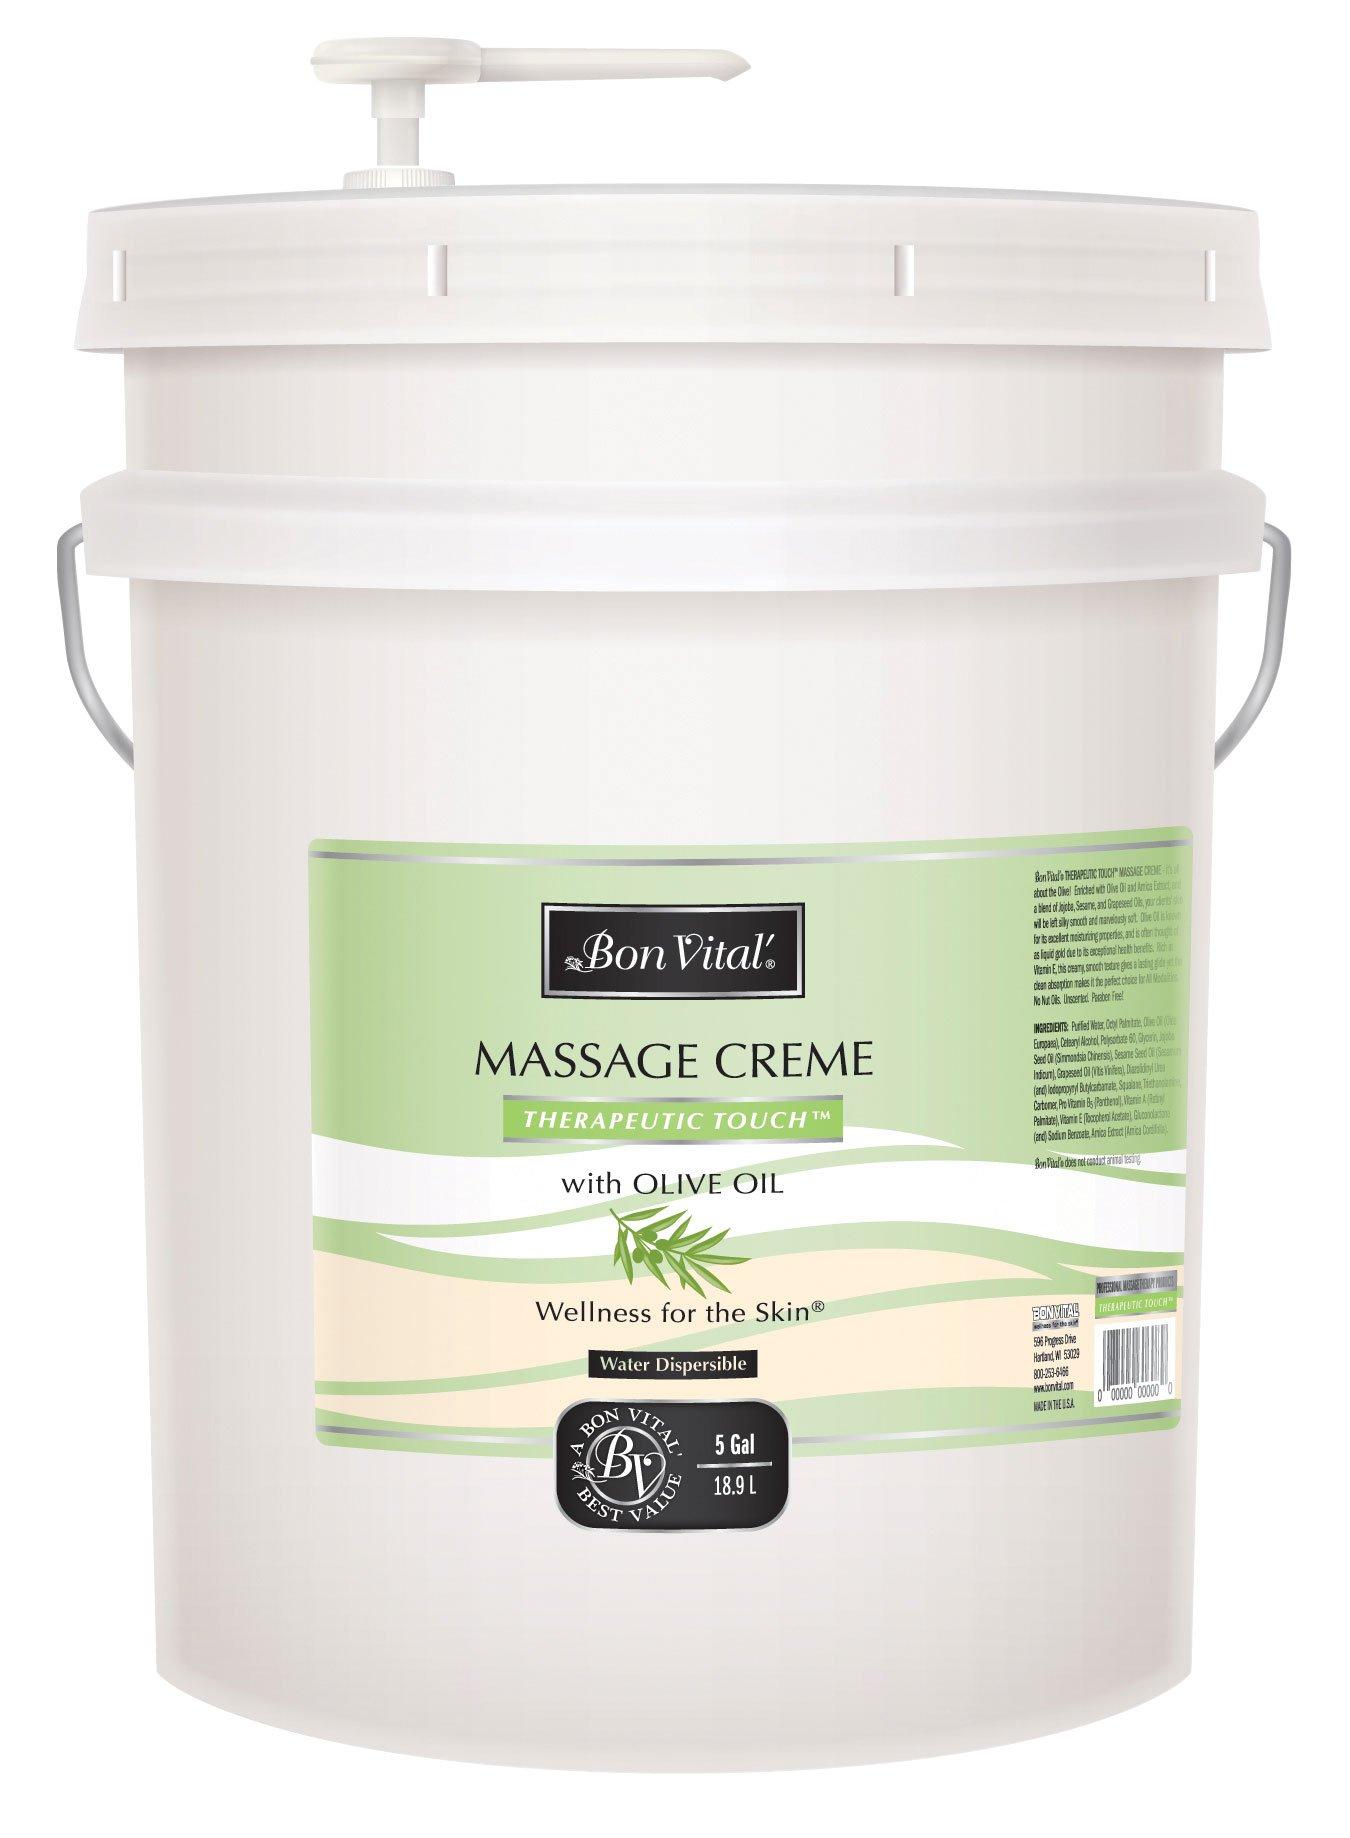 Bon Vital Therapeutic Touch Massage Creme, 5 Gallon Pail